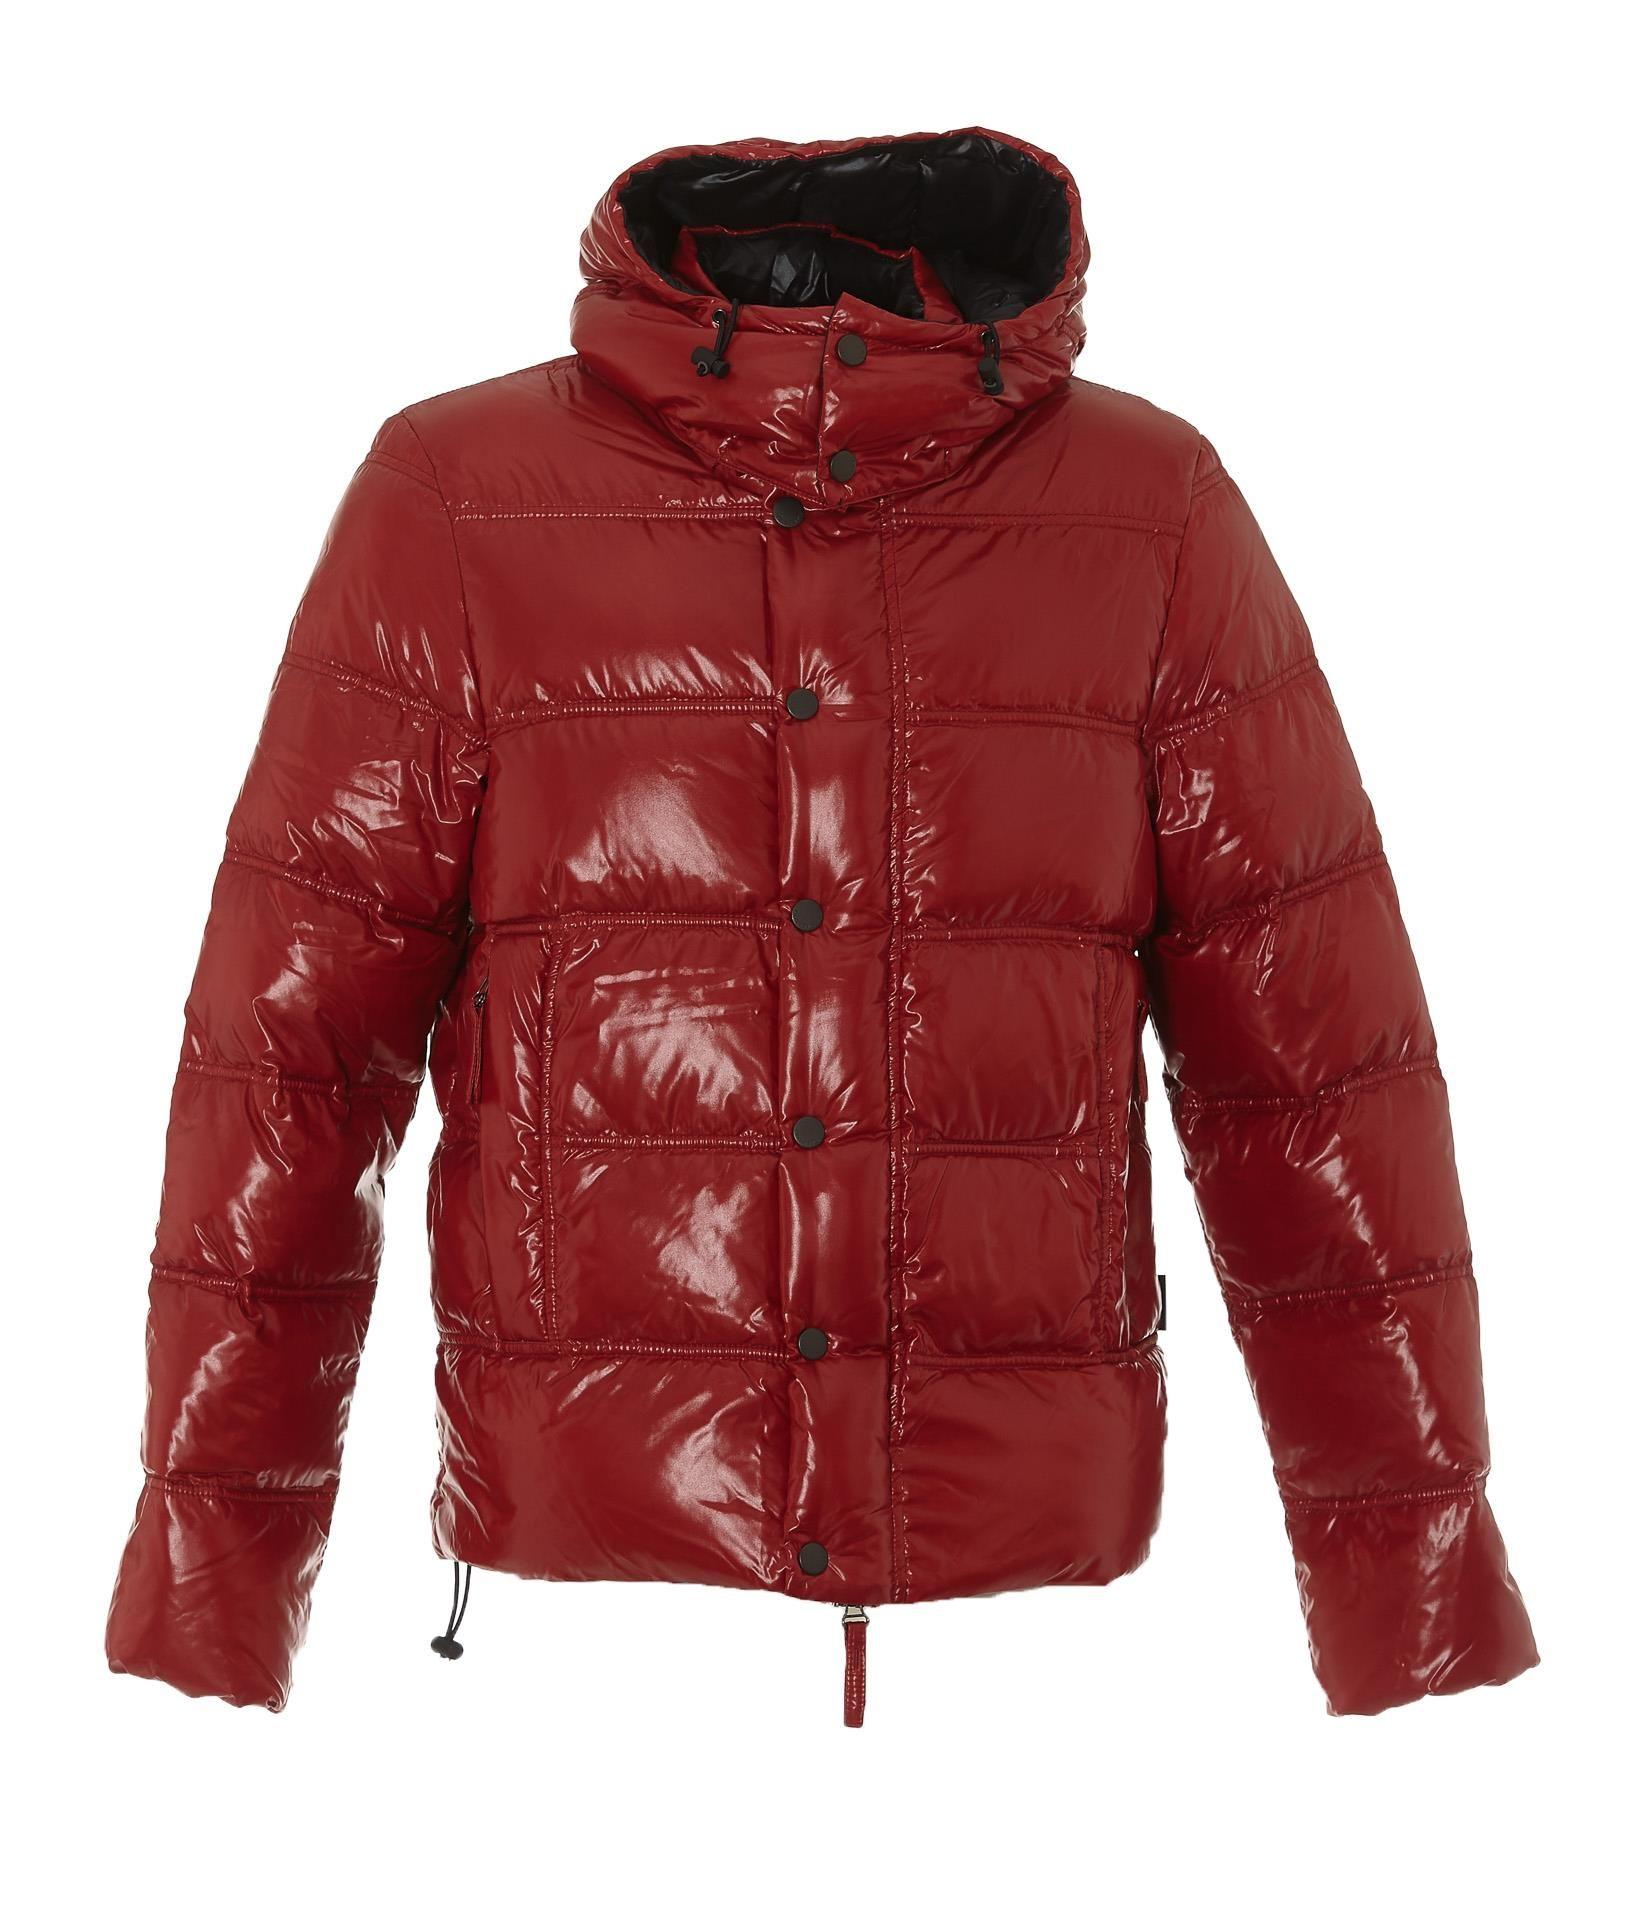 DUVETICA 亮面连帽羽绒服. #duvetica #cloth | Winter jackets